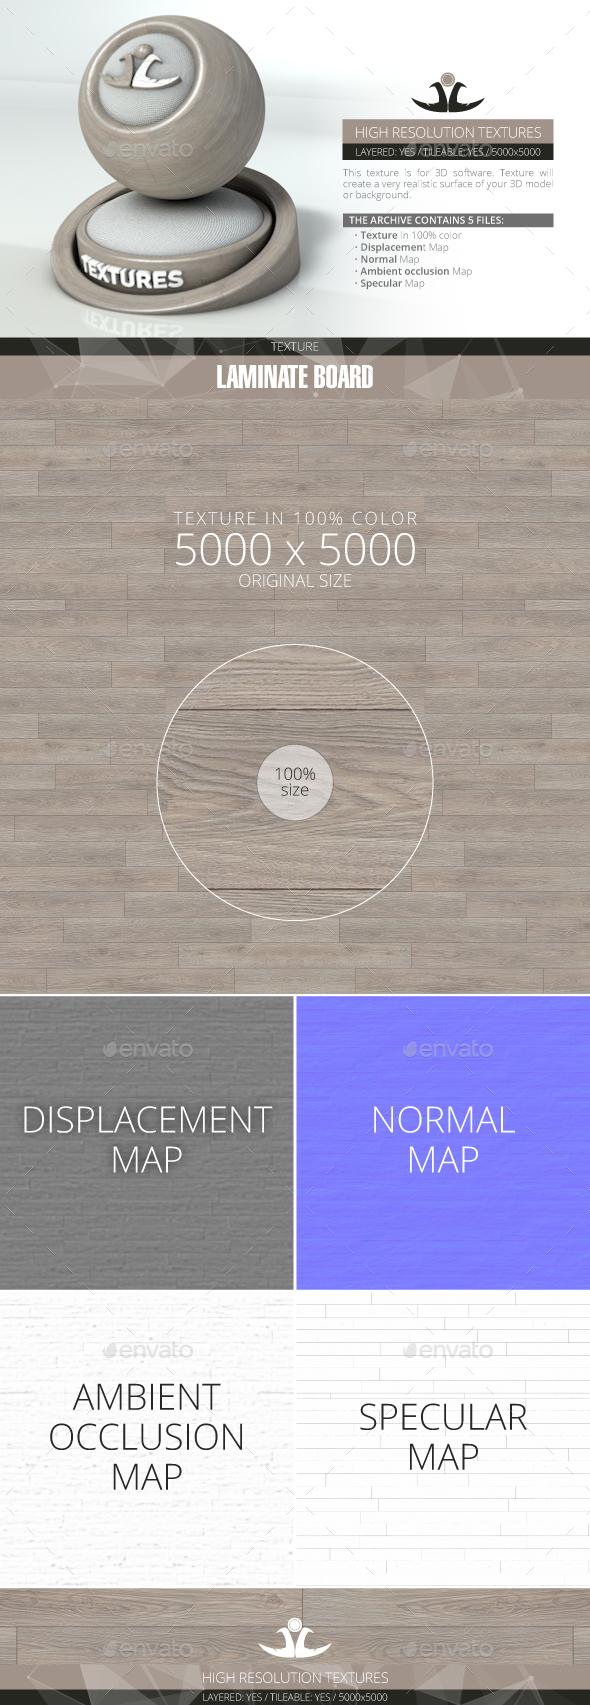 Laminate Board 53 - 3DOcean Item for Sale